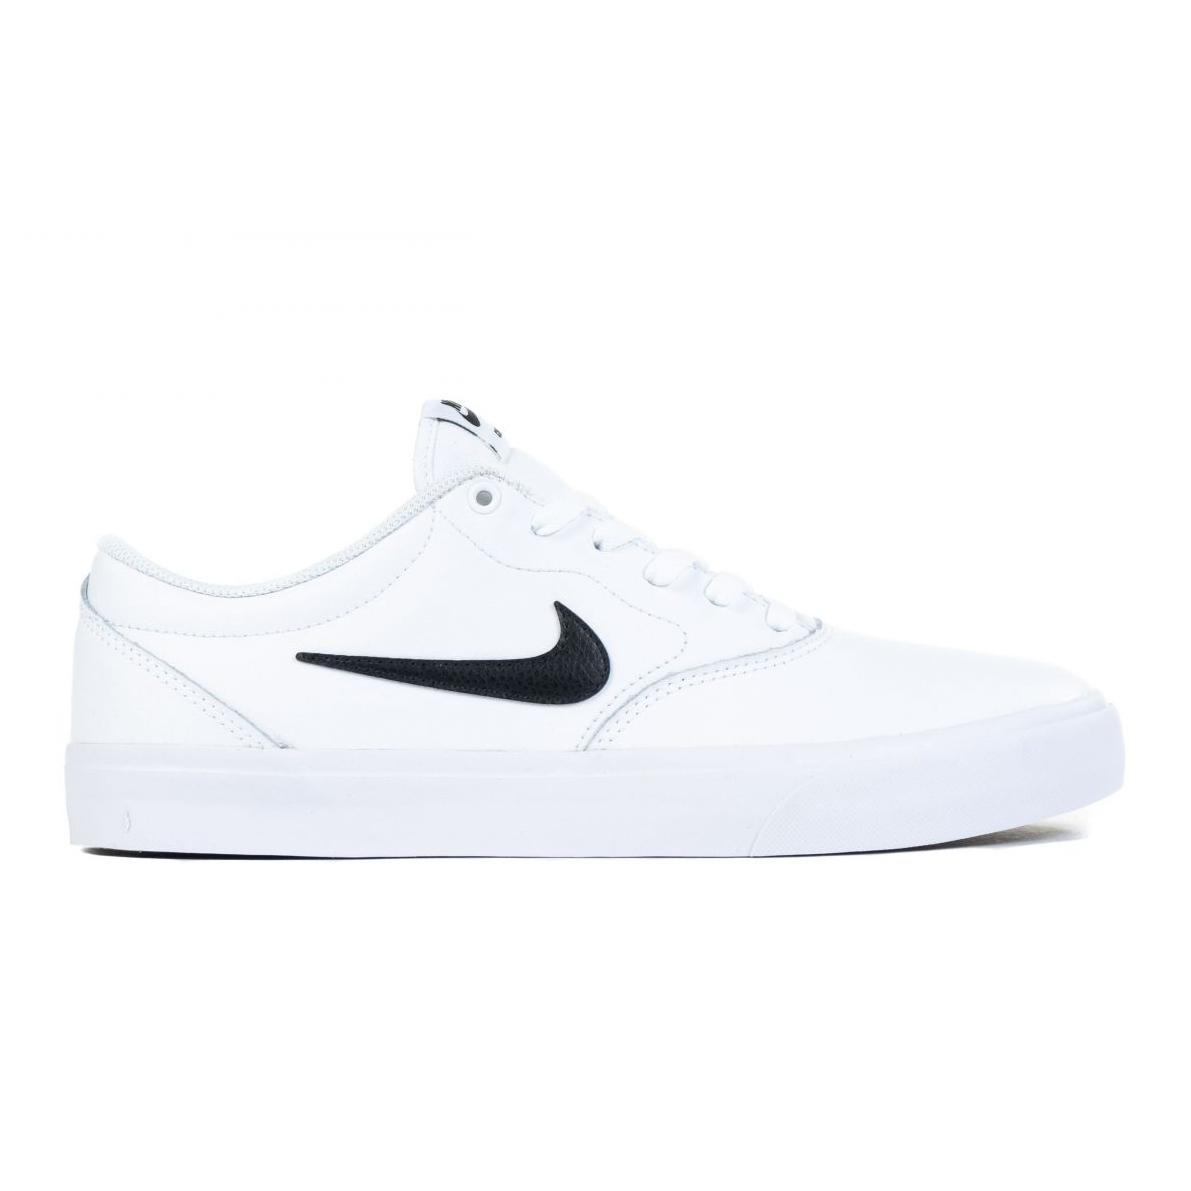 Nike Sb Charge Prm M DA5493-100 white - KeeShoes